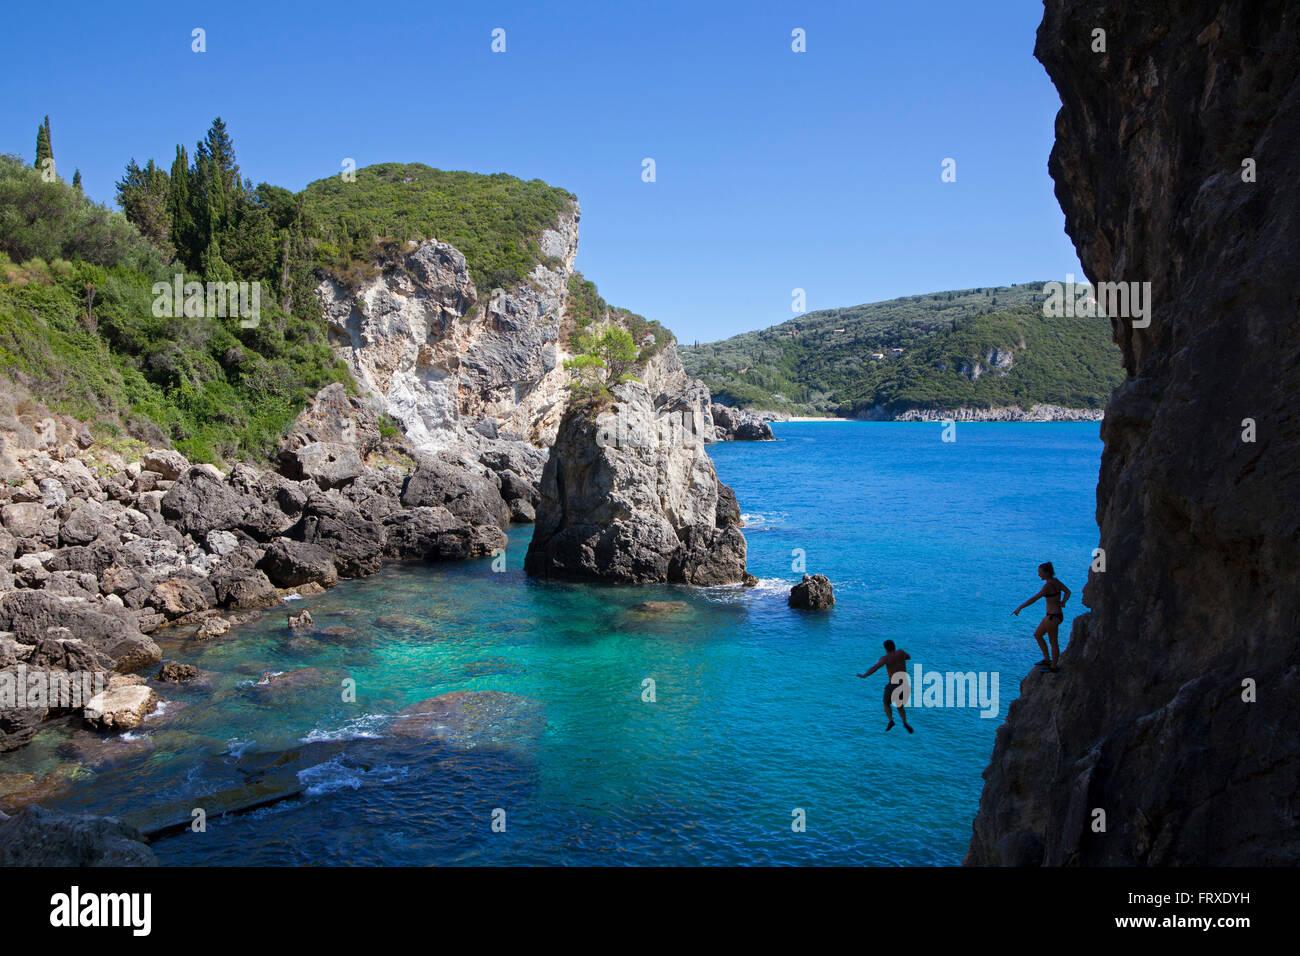 Man jumping from the cliff near the beach bar La Grotta, La Grotta Bay, near Paleokastritsa, Corfu island, Ionian - Stock Image